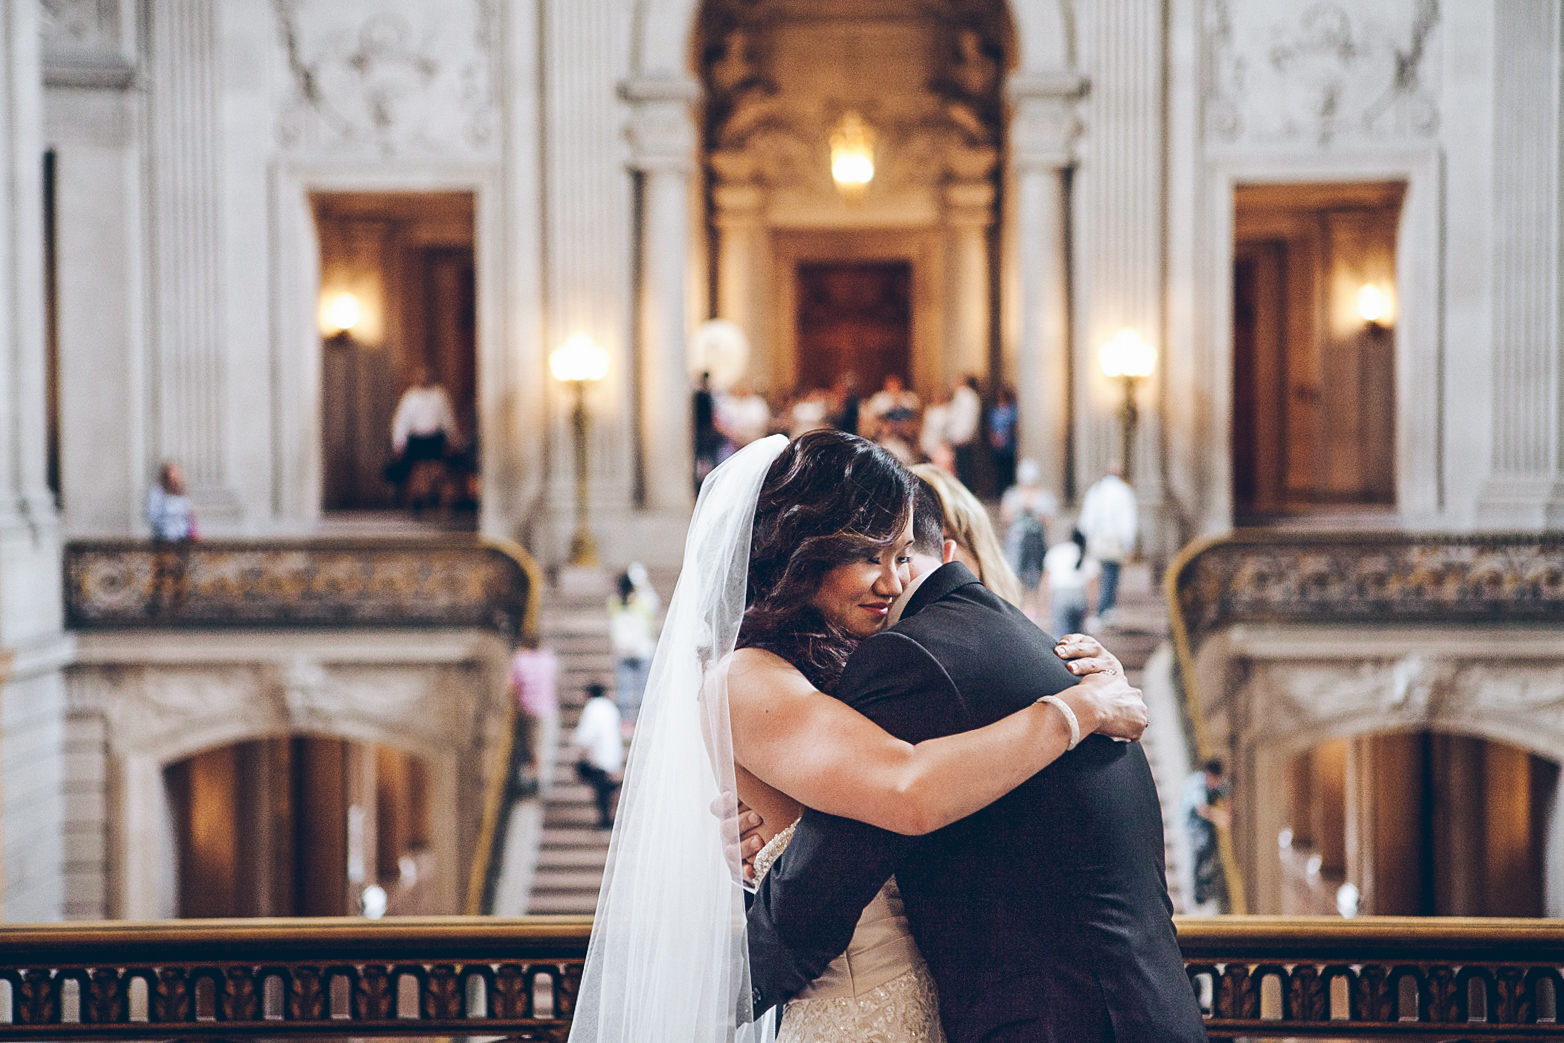 San_francisco_city_hall_wedding_photography_meegan_travis_ebony_siovhan_bokeh_photography_24.jpg